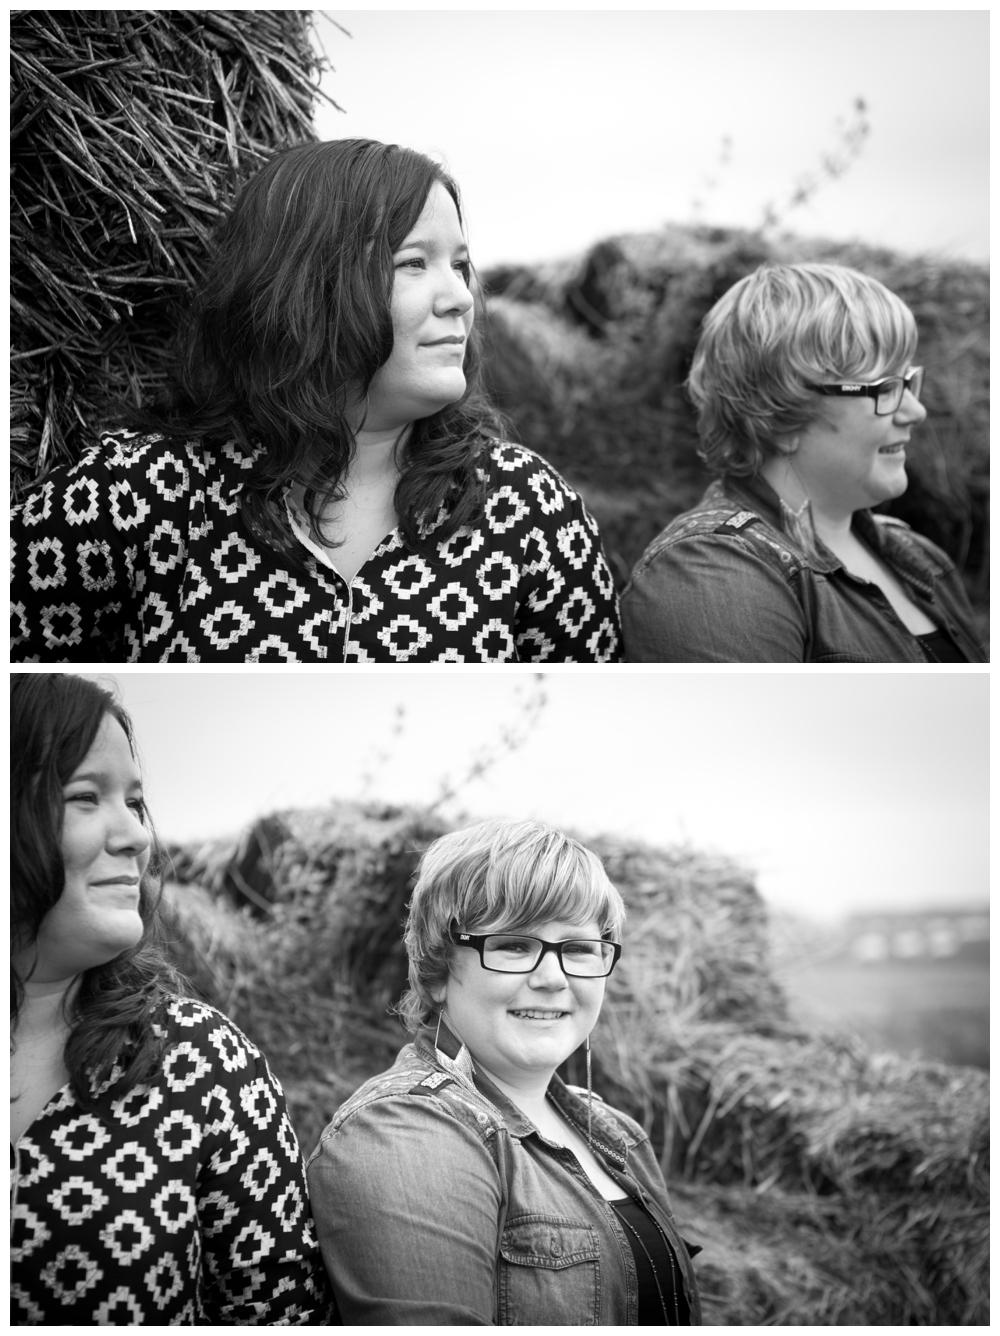 Portretshoot Myrthe&Martine ZW20.jpg